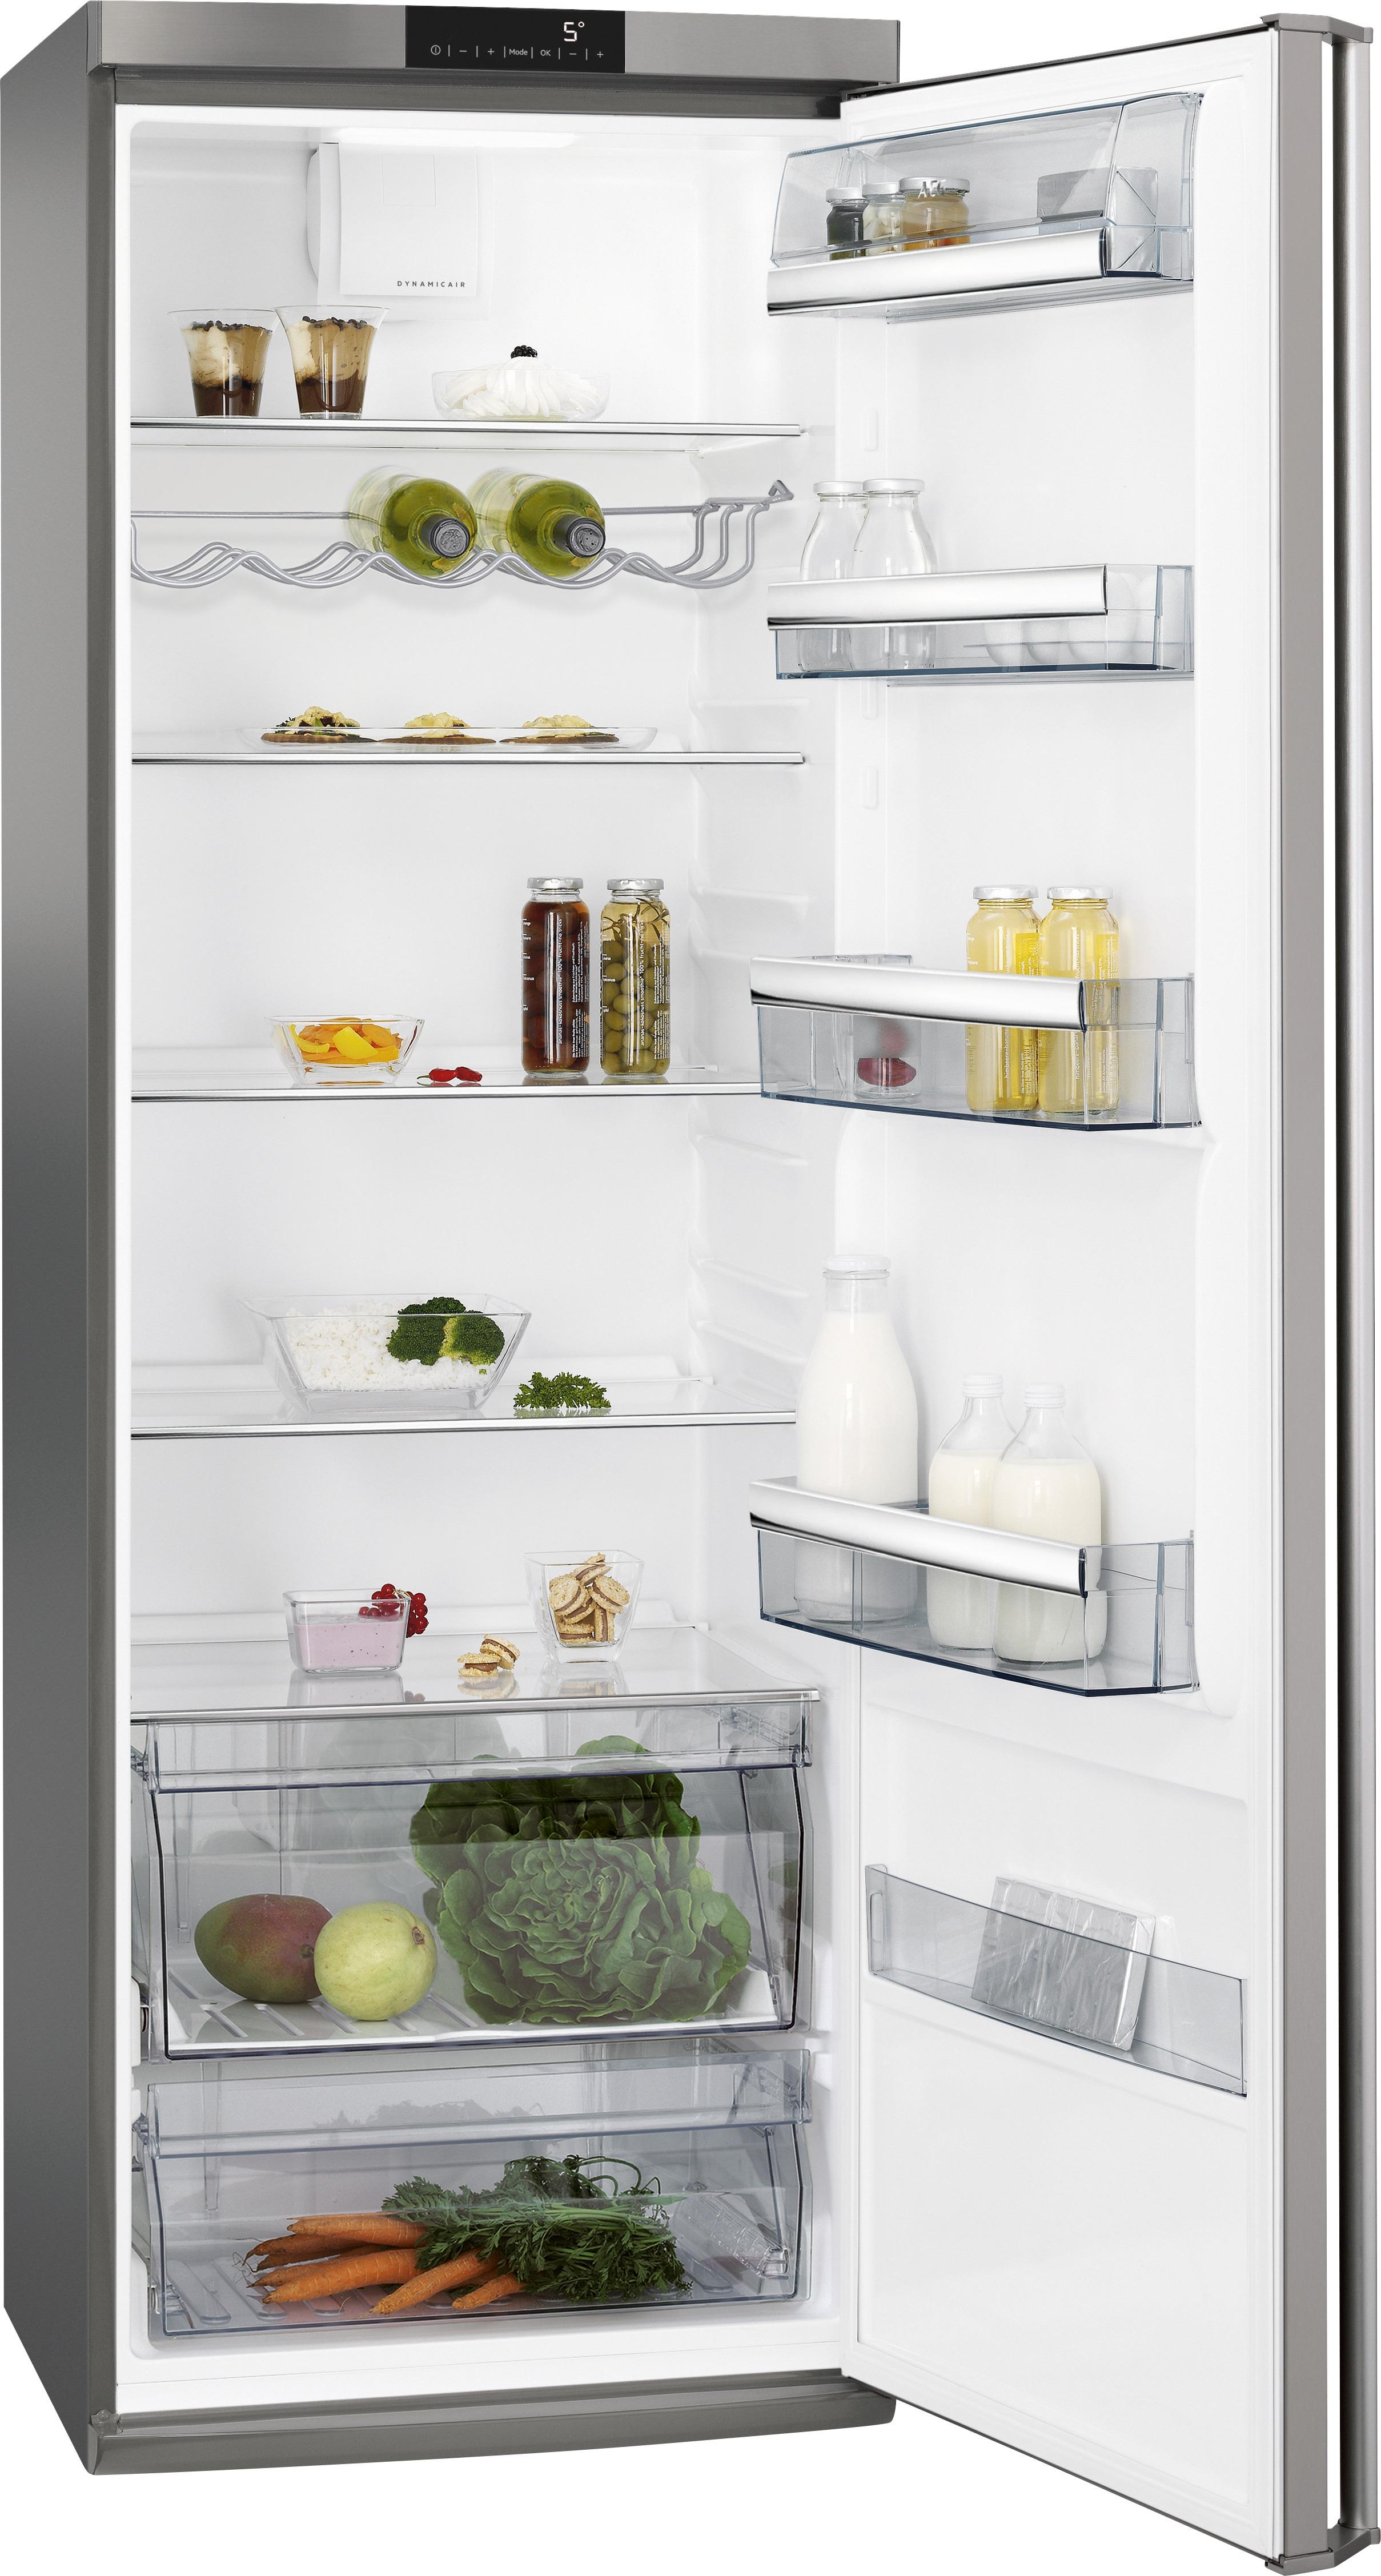 AEG koelkast zonder vriesvak RKB64021DX